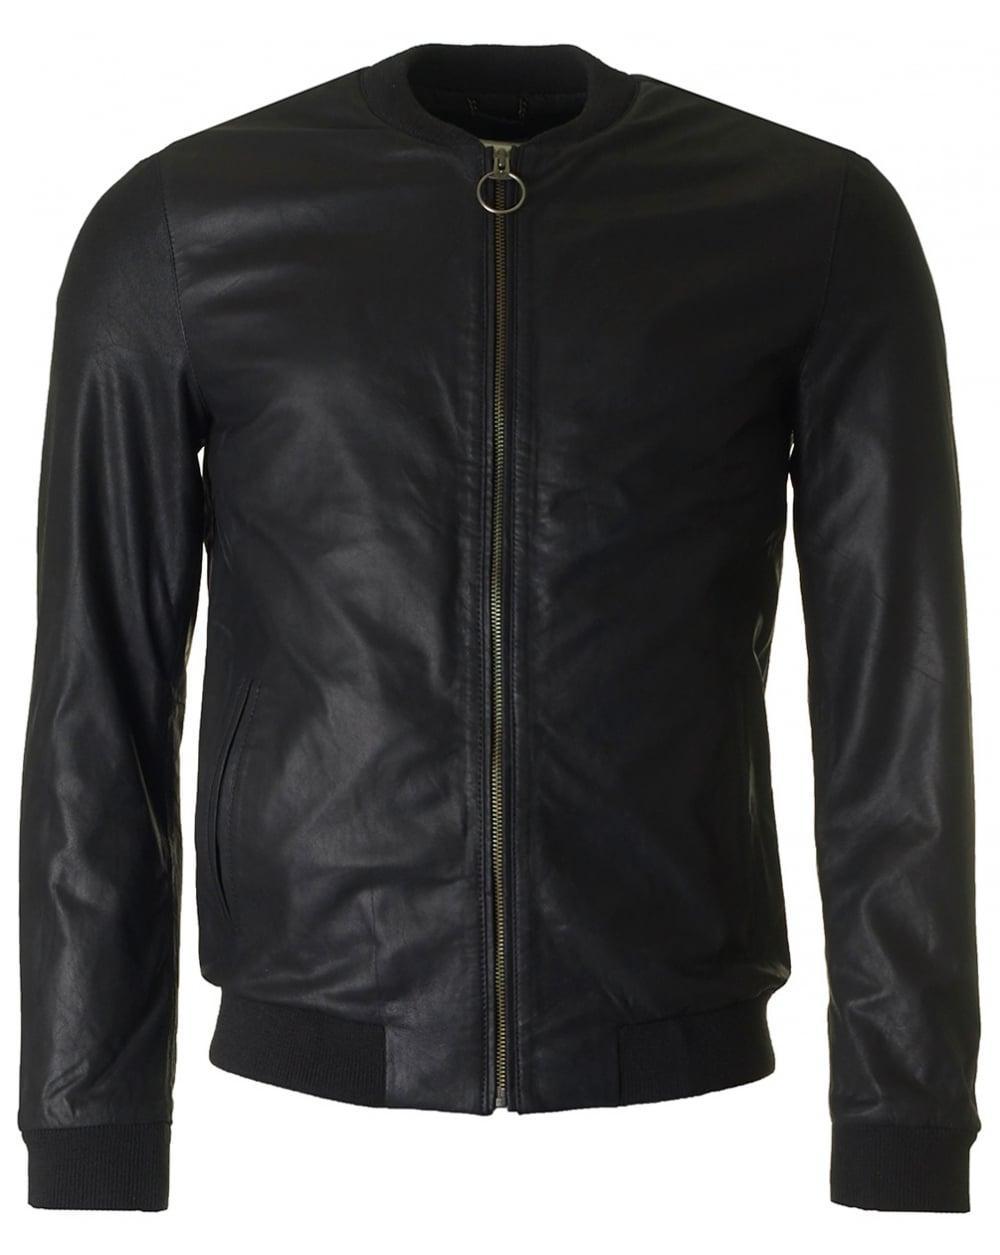 Henley leather jacket